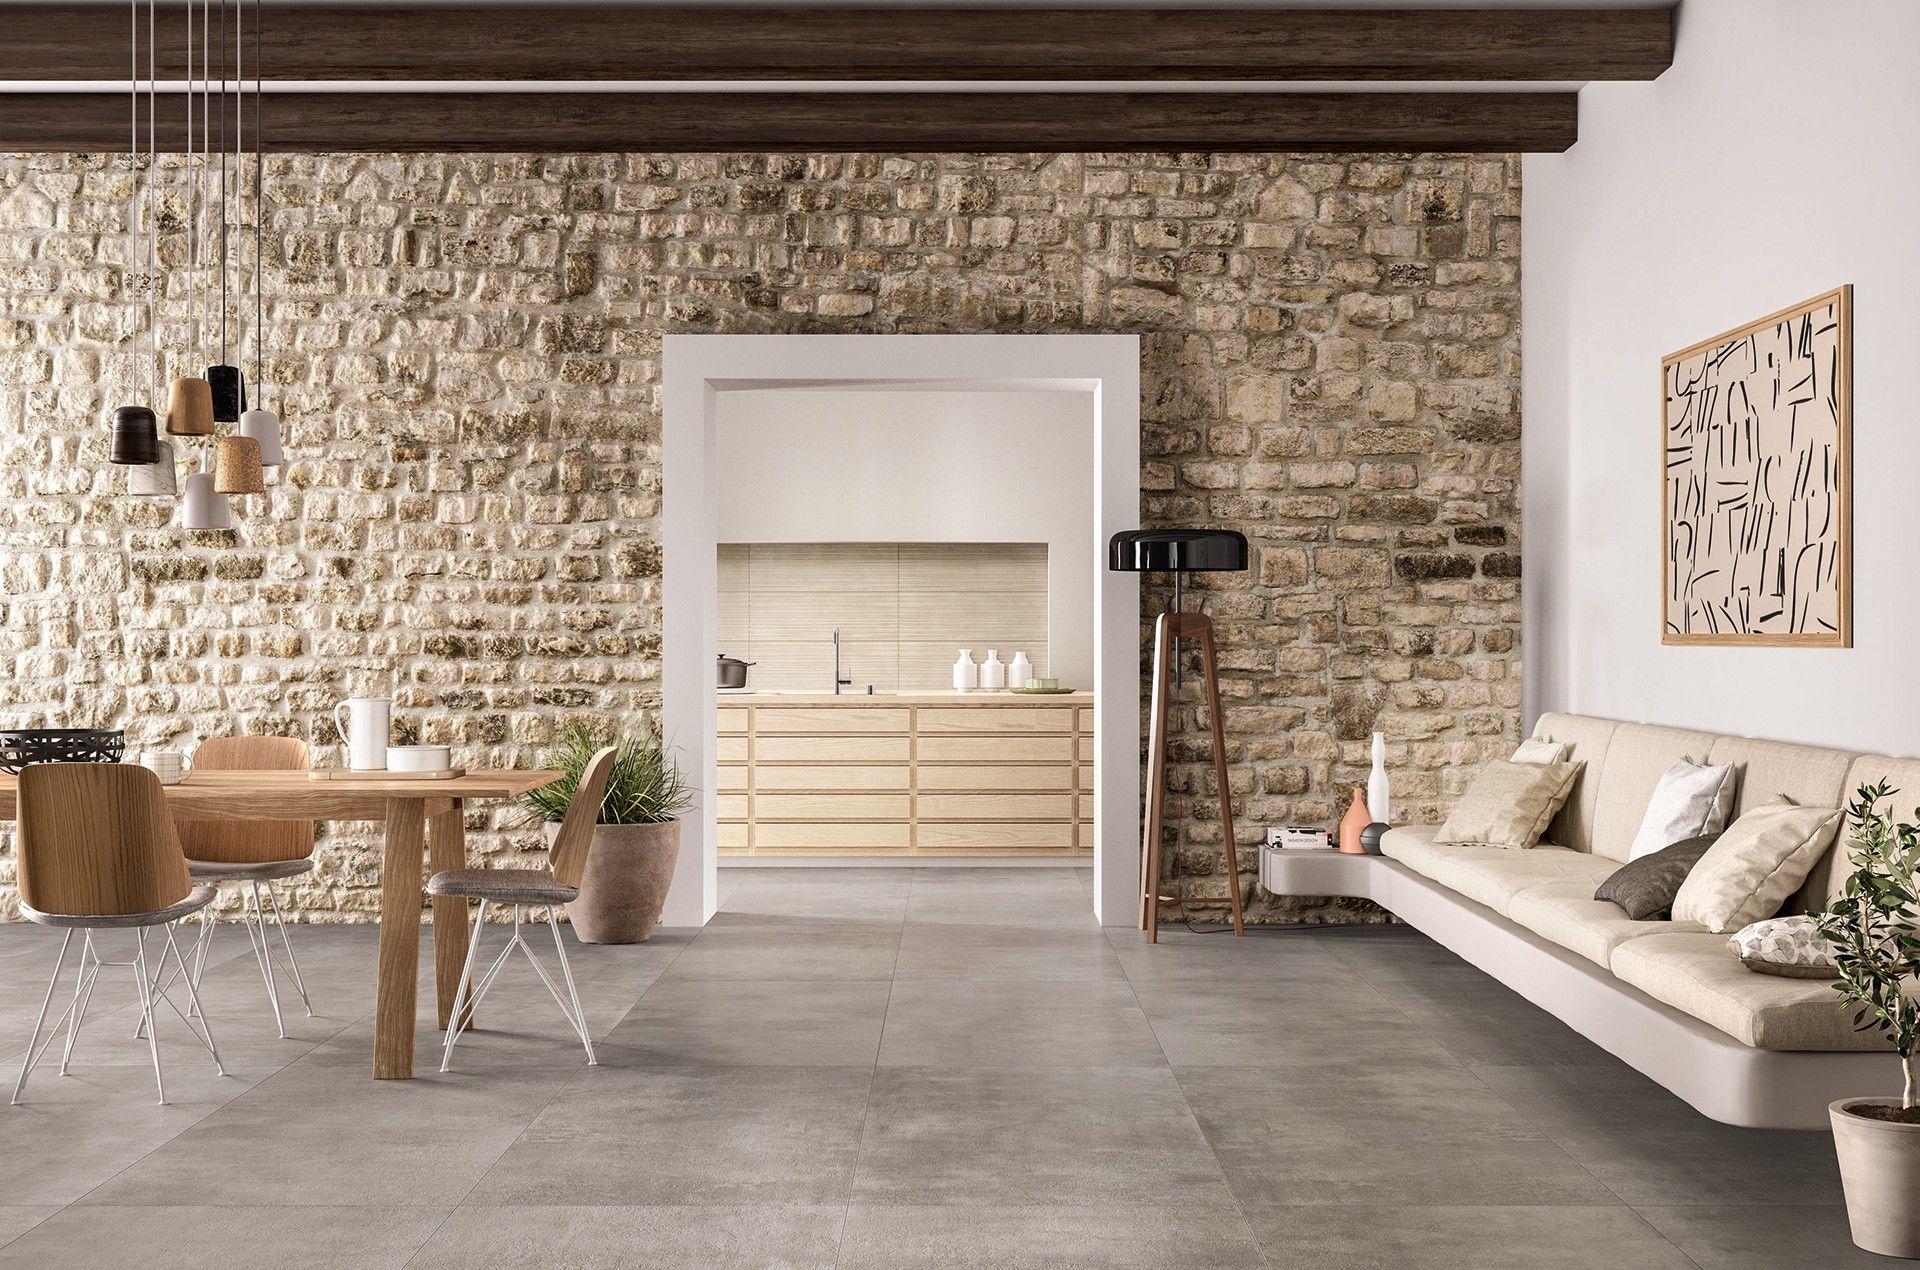 Marazzi Memento Casa Ceramica Living Room Tiles Appartment Decor Modern Houses Interior #stone #wall #tiles #for #living #room